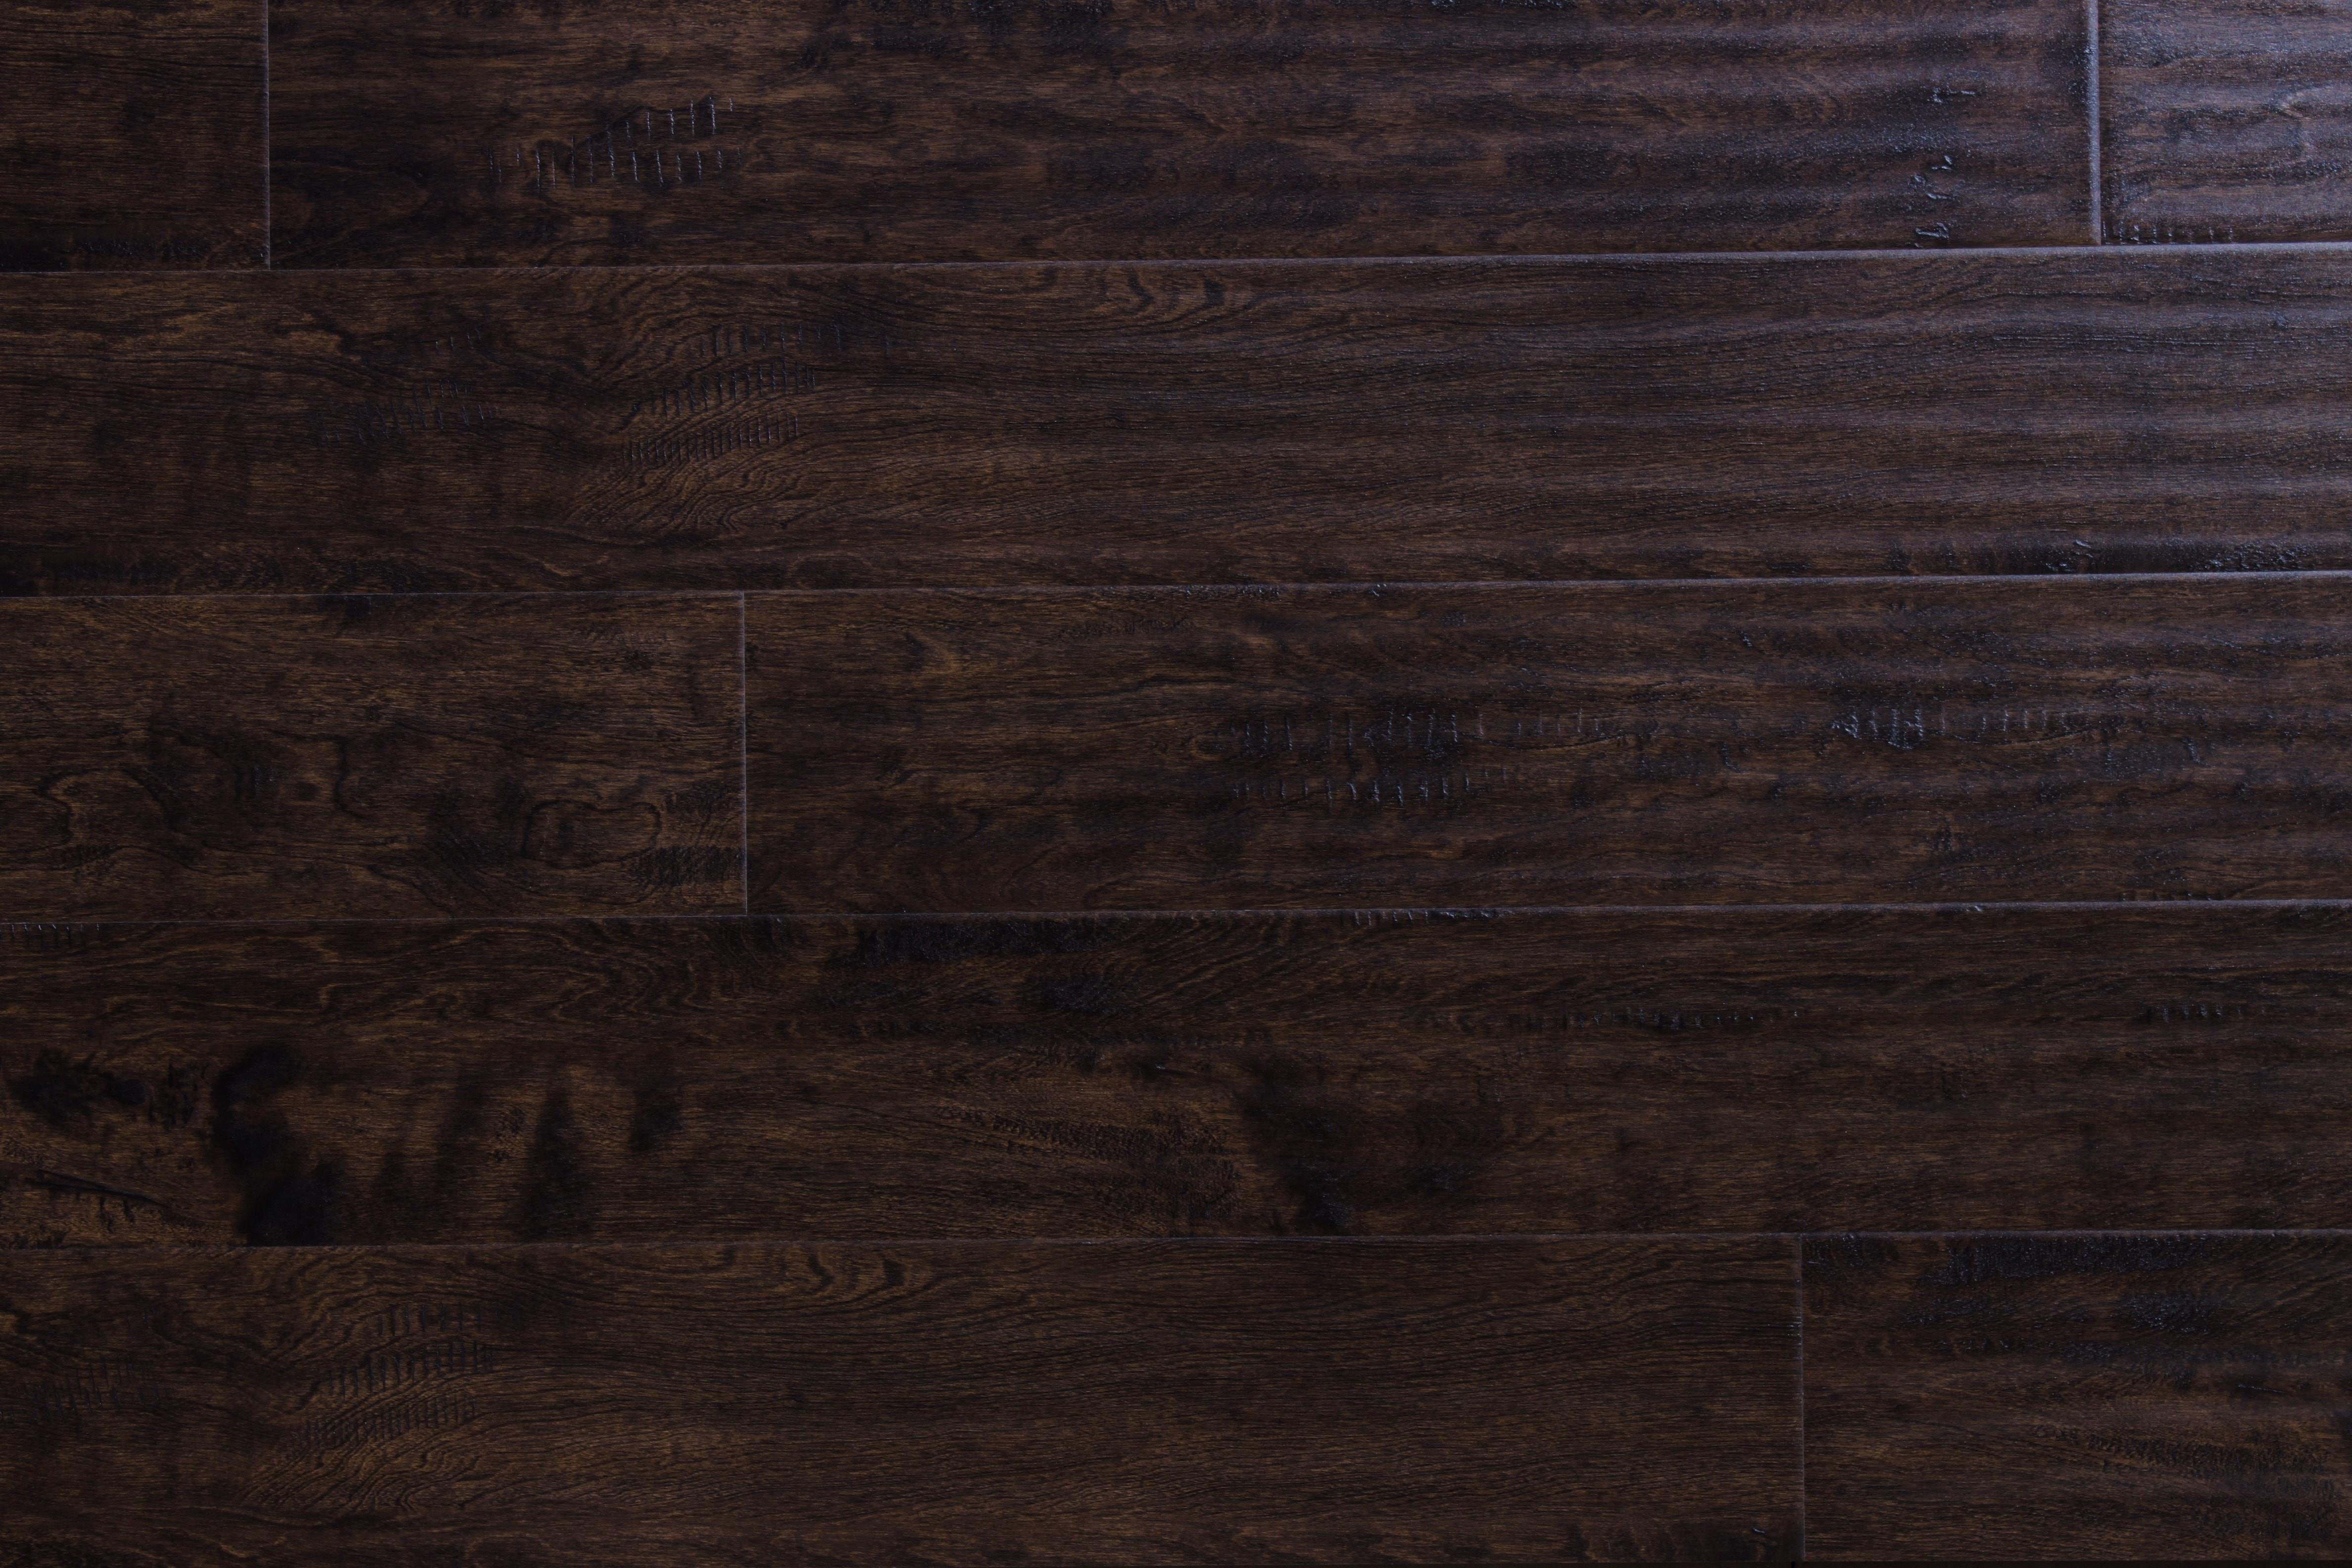 model hardwood flooring canada of wood flooring free samples available at builddirecta inside tailor multi gb 5874277bb8d3c